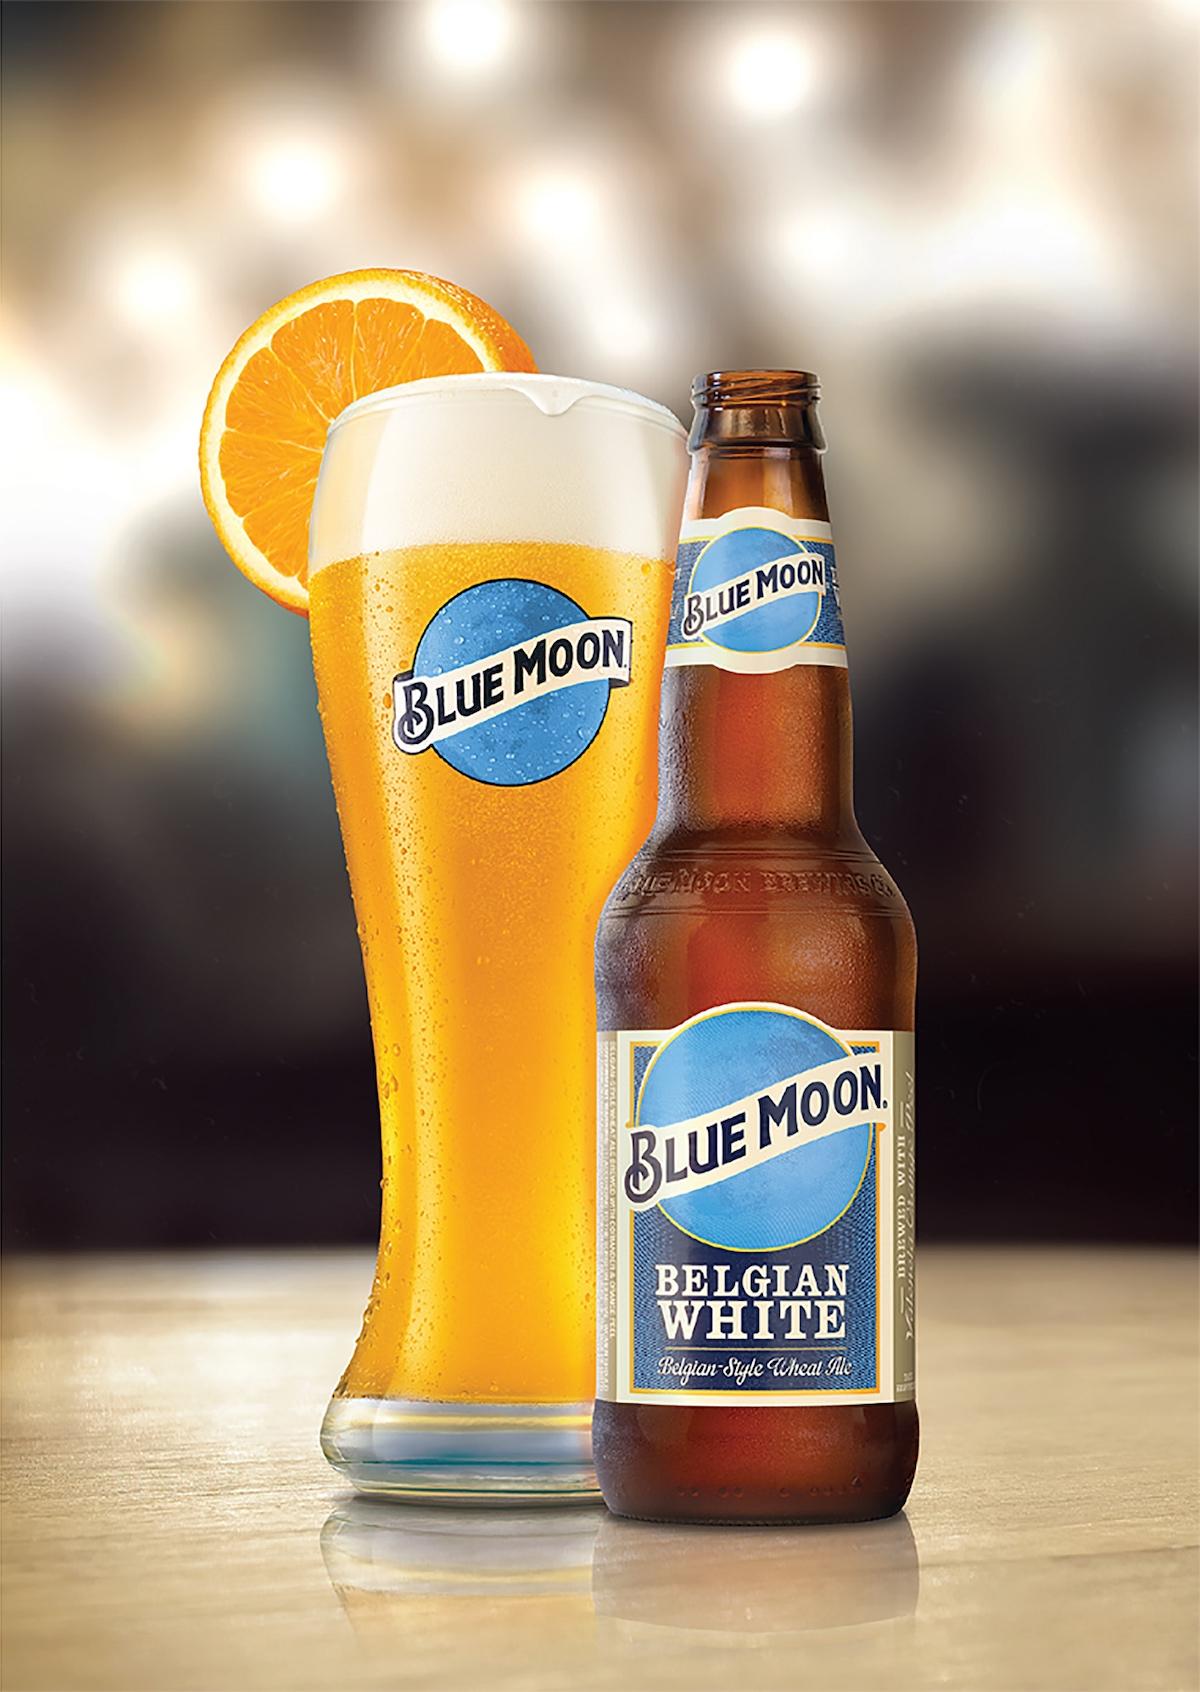 Pivo Blue Moon Belgian White v lahvi